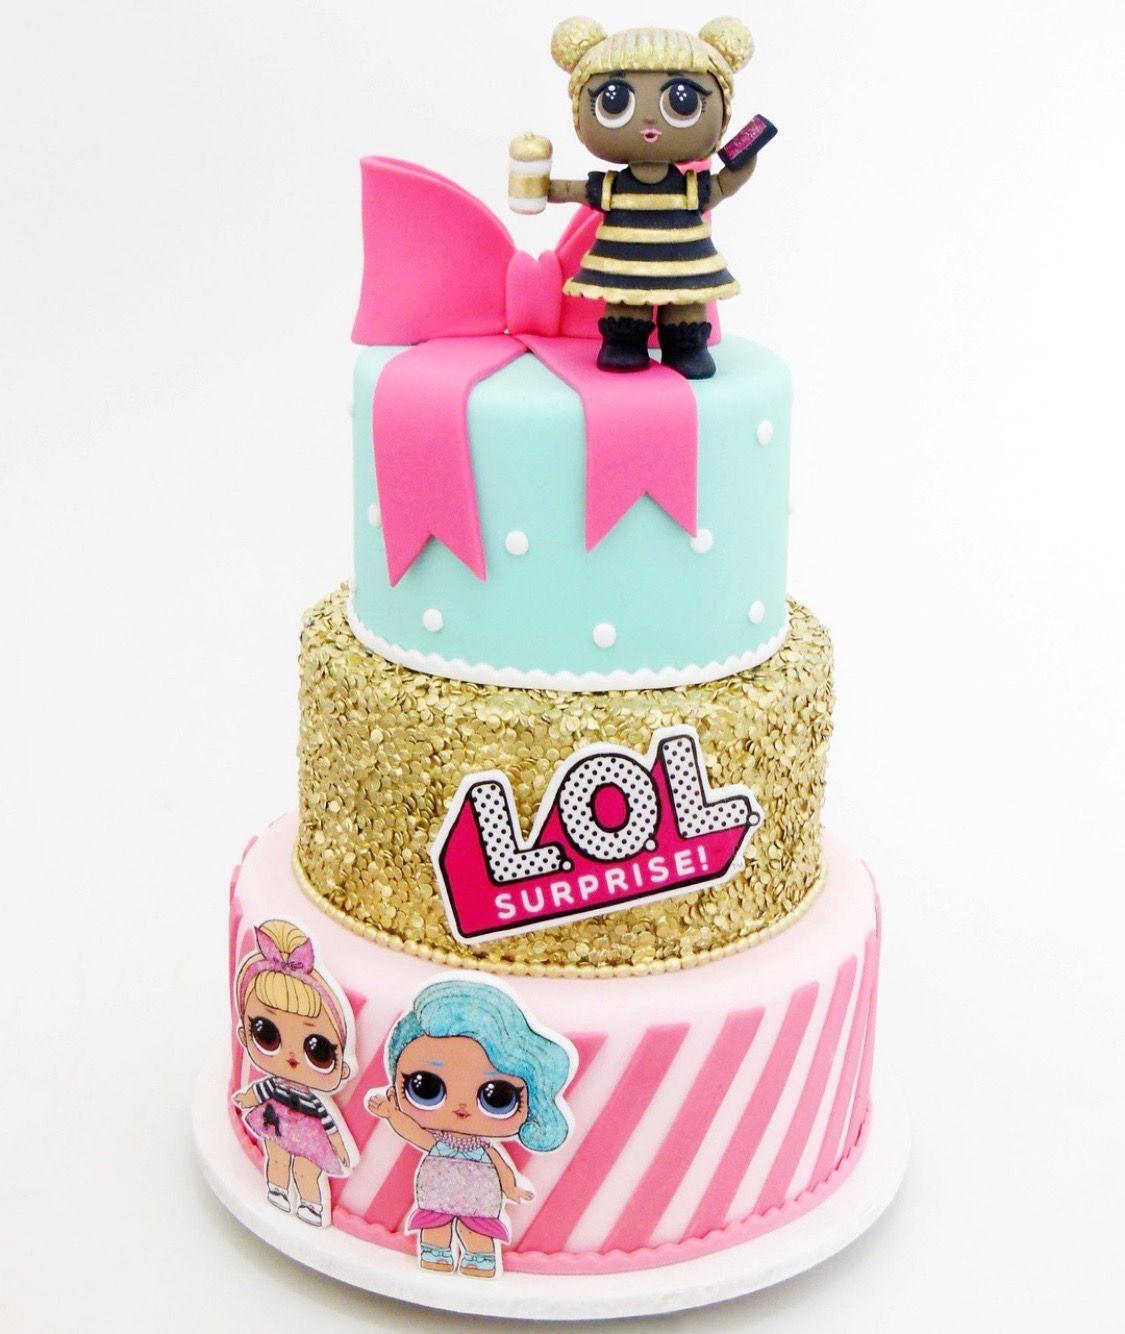 Lol Surprise Cake Topper